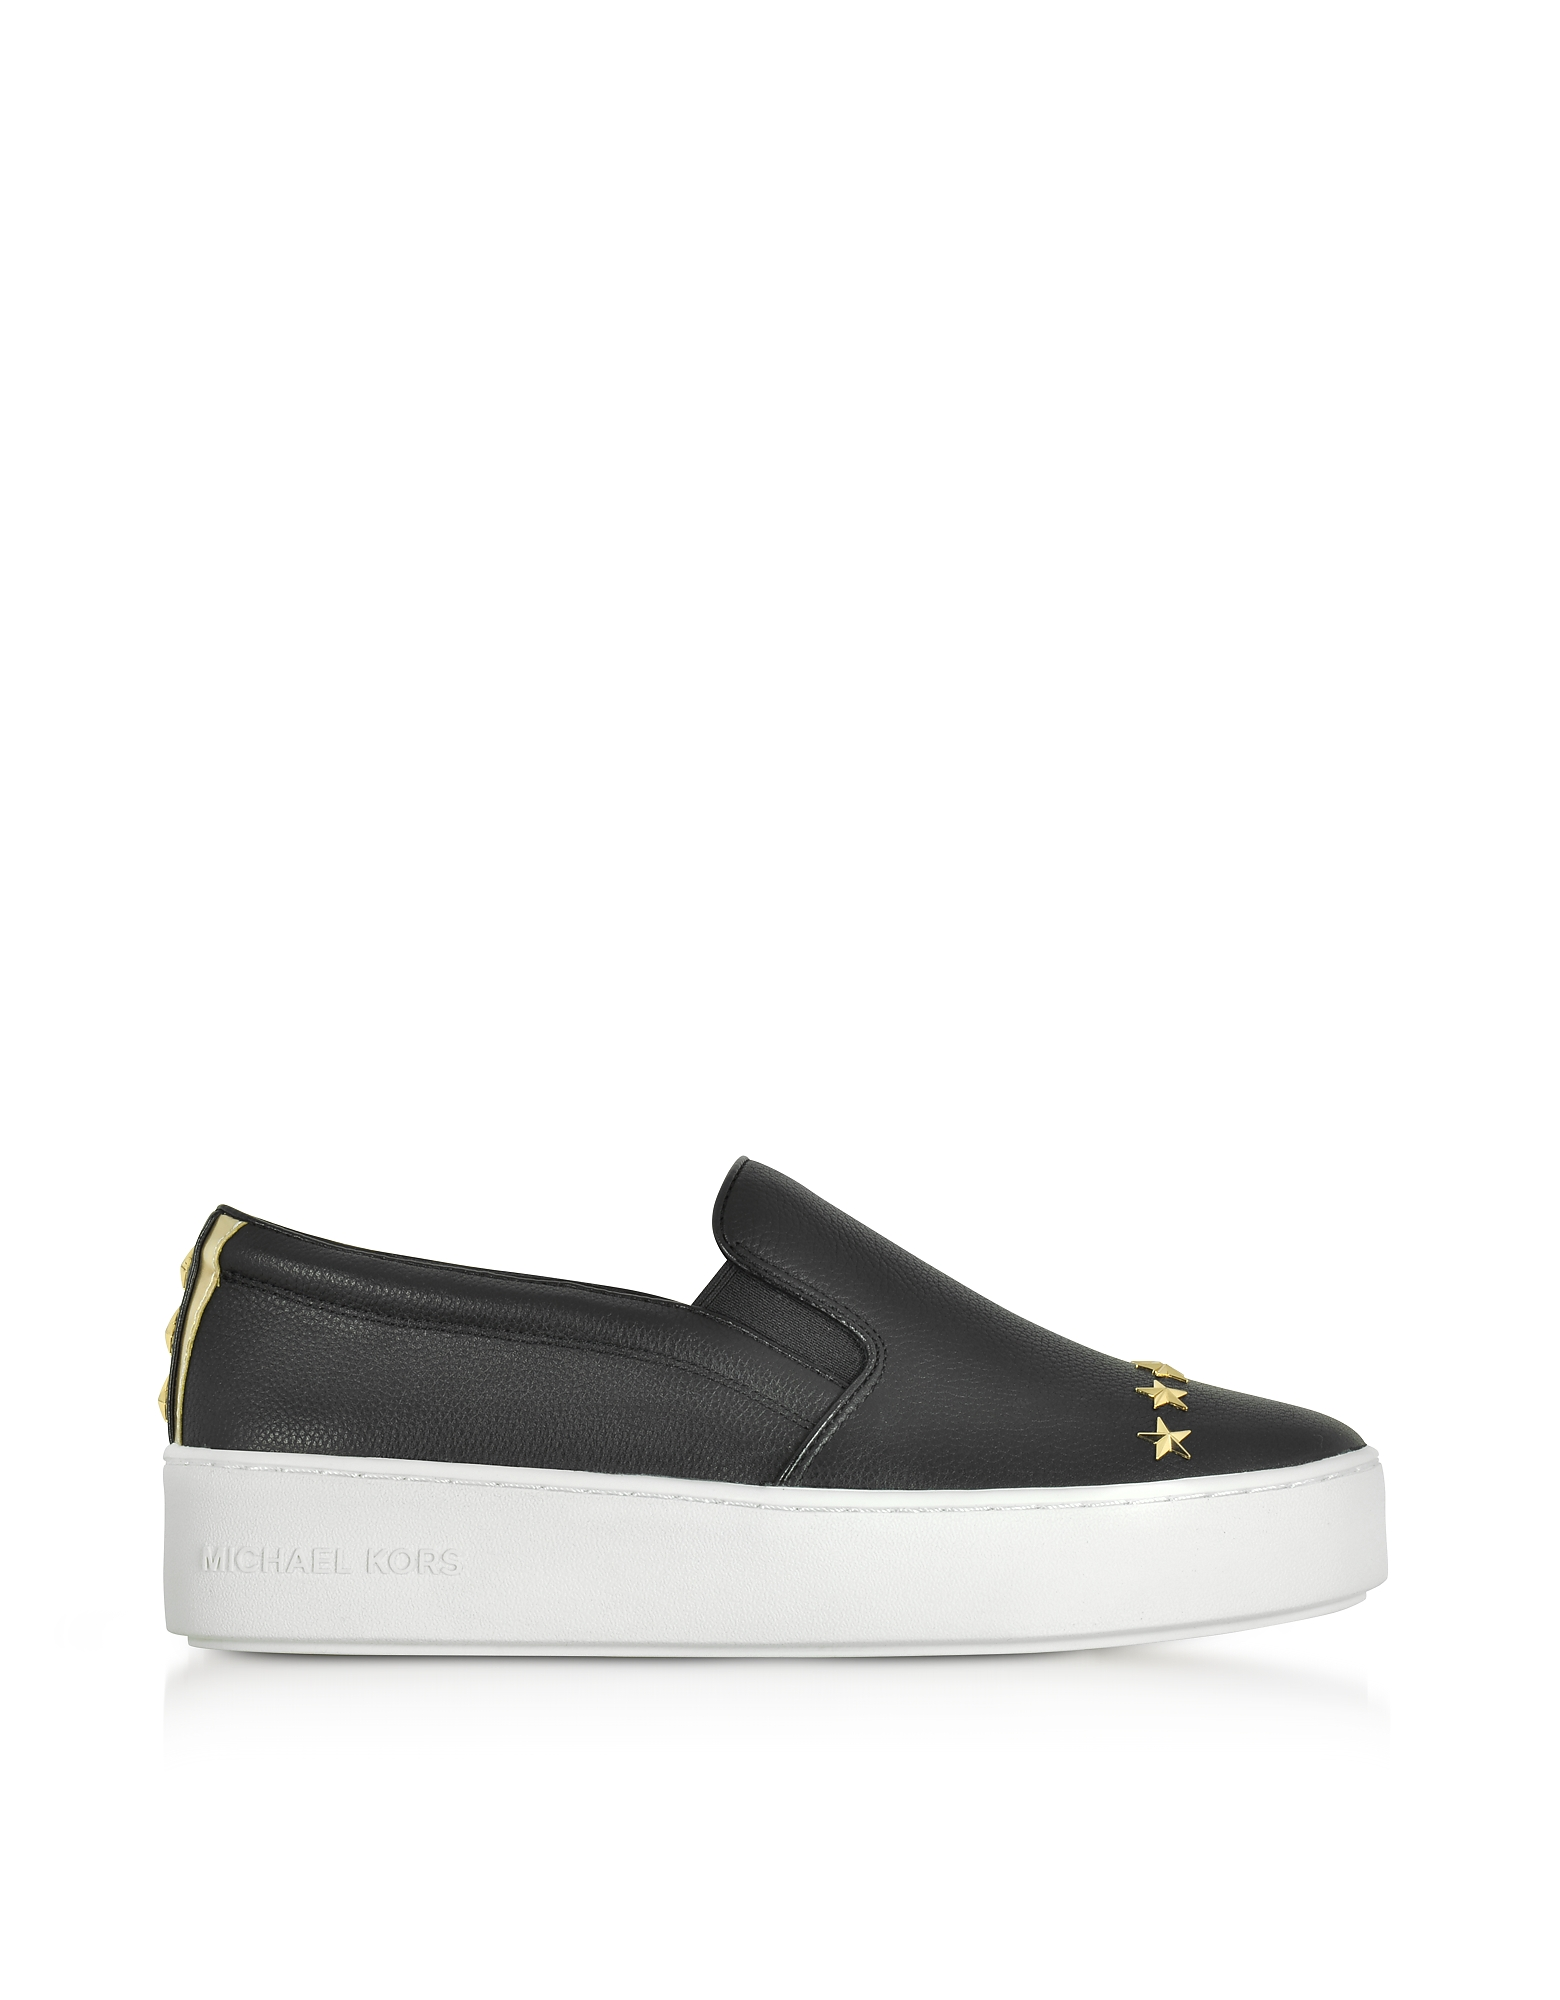 Michael Kors Shoes, Trent Black Leather Embellished Slip On Sneakers w/Goldtone Stars